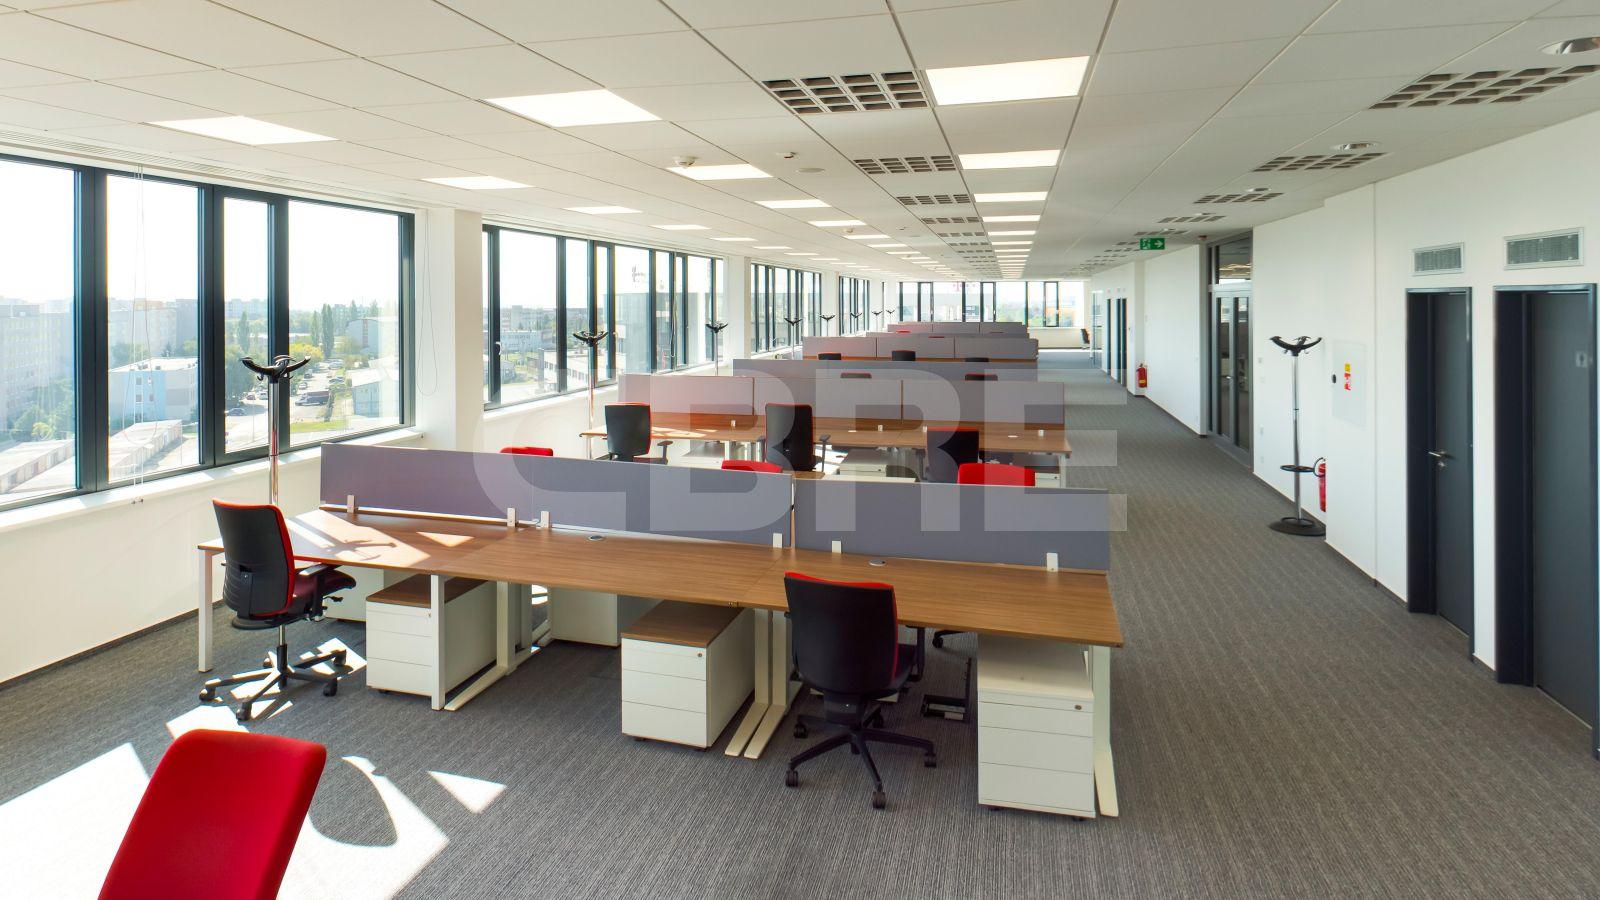 Business Center Tesla II., Košice - Staré Mesto | Offices for rent by CBRE | 6